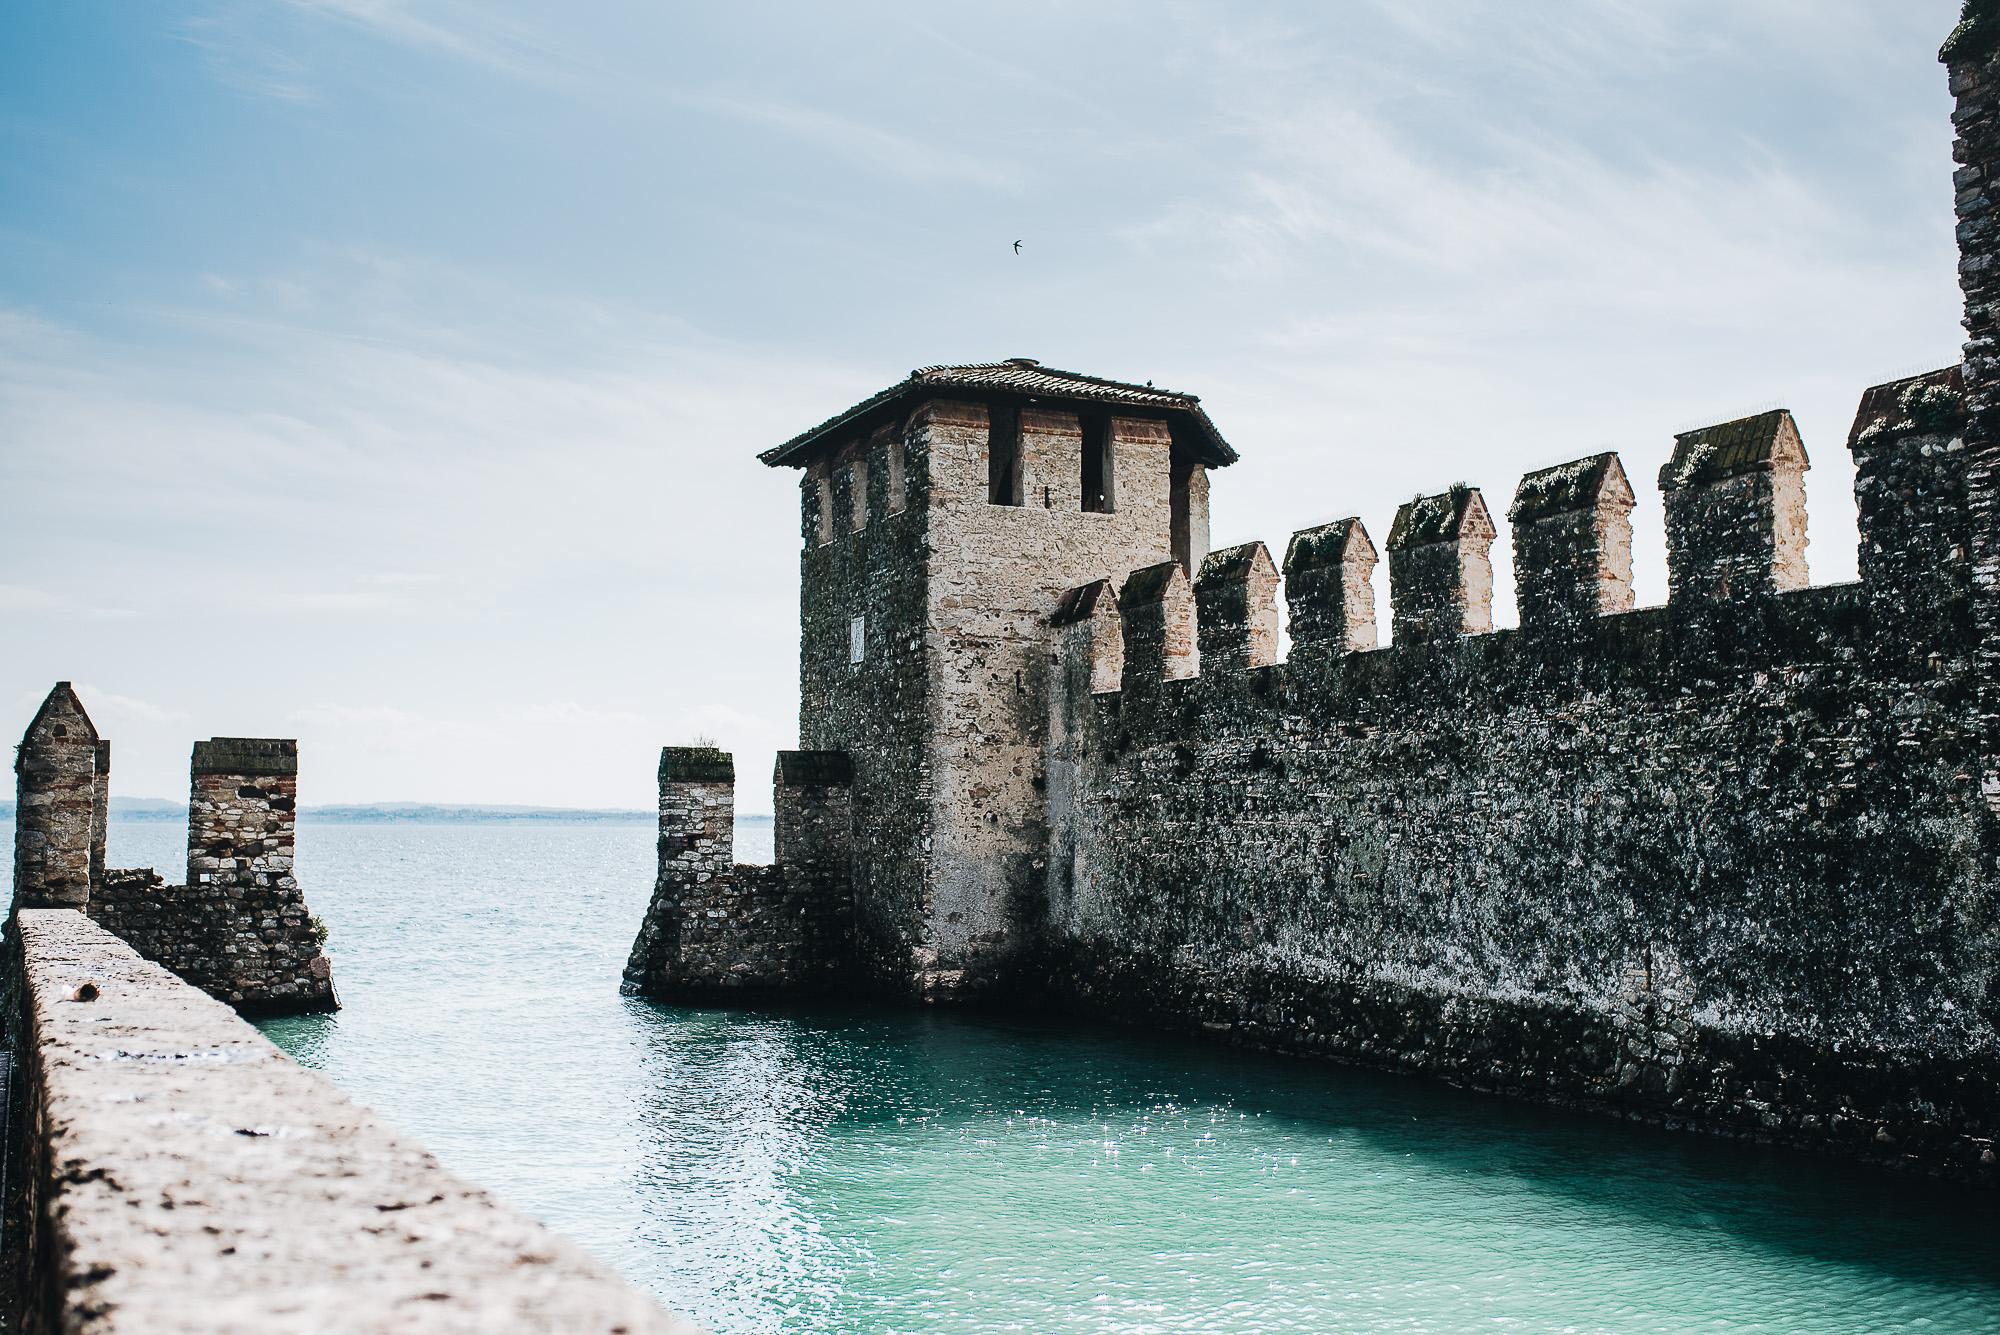 OurBeautifulAdventure-LakeGarda-Italy-Blog-0746.jpg